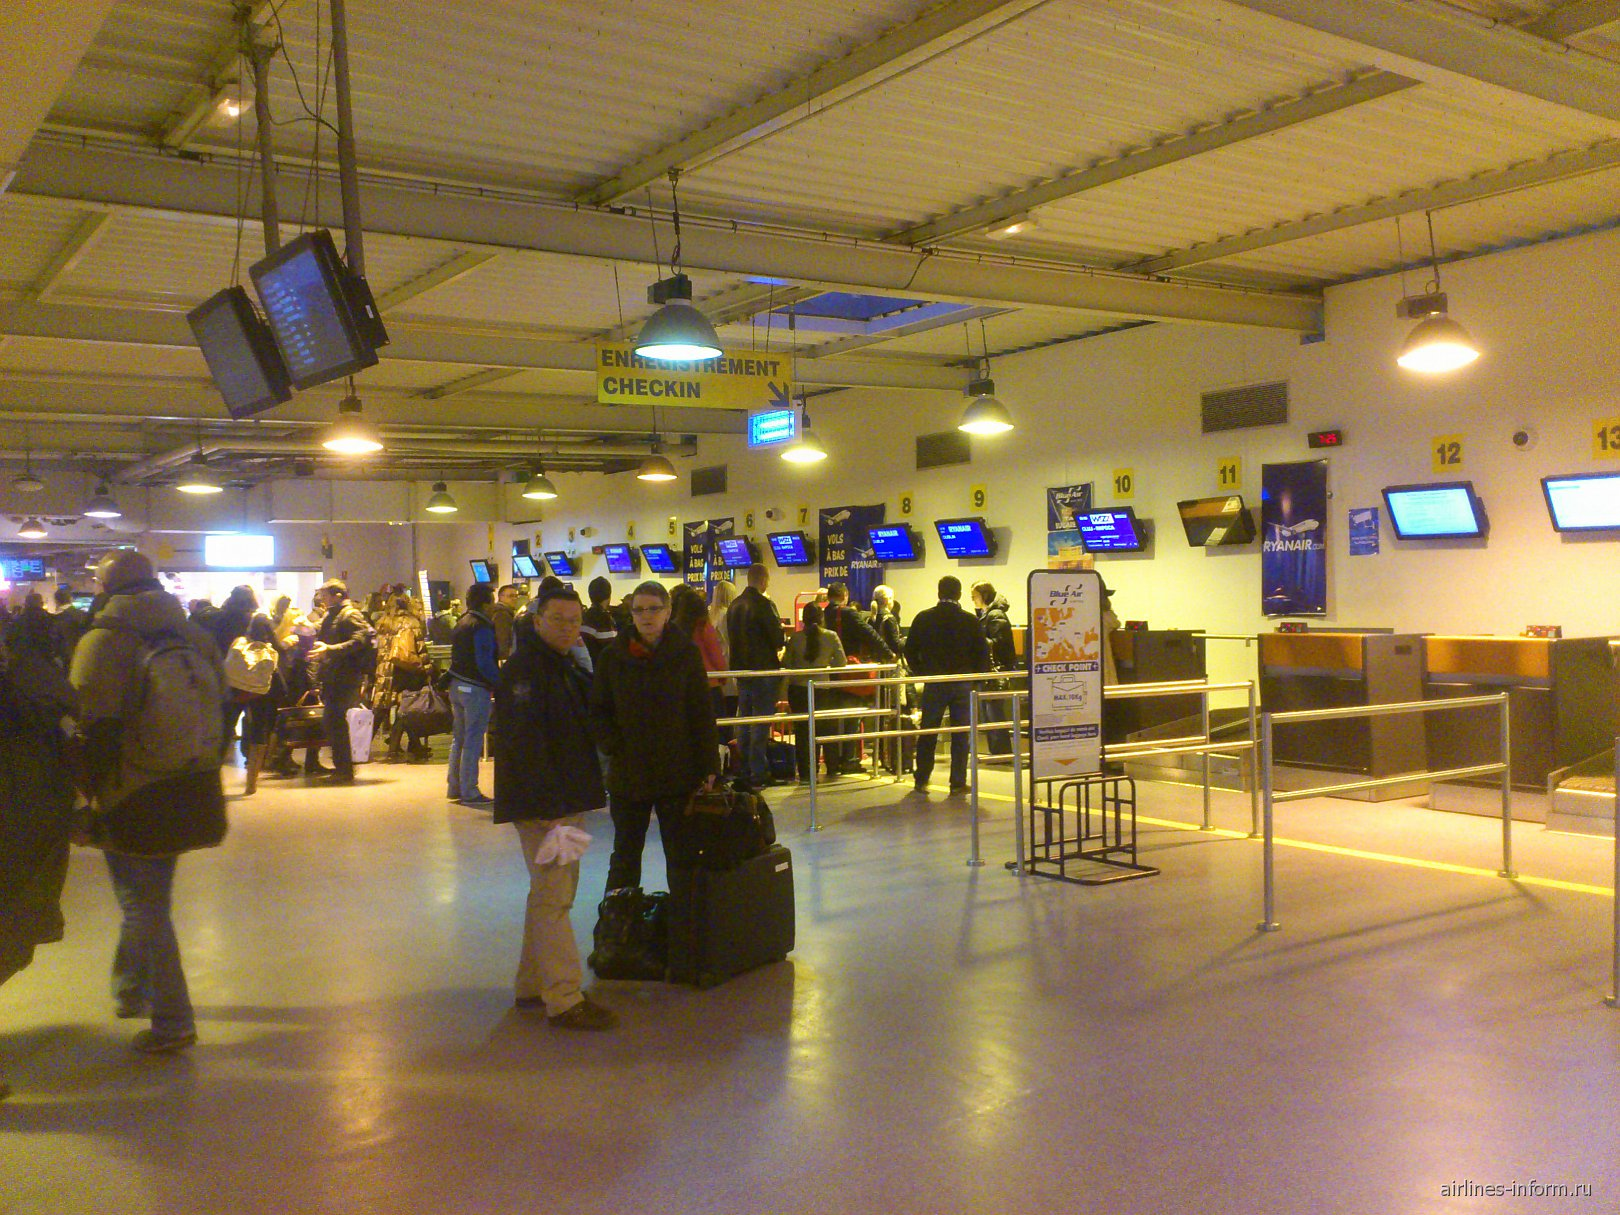 Стойки регистрации в аэропорту Париж Бове